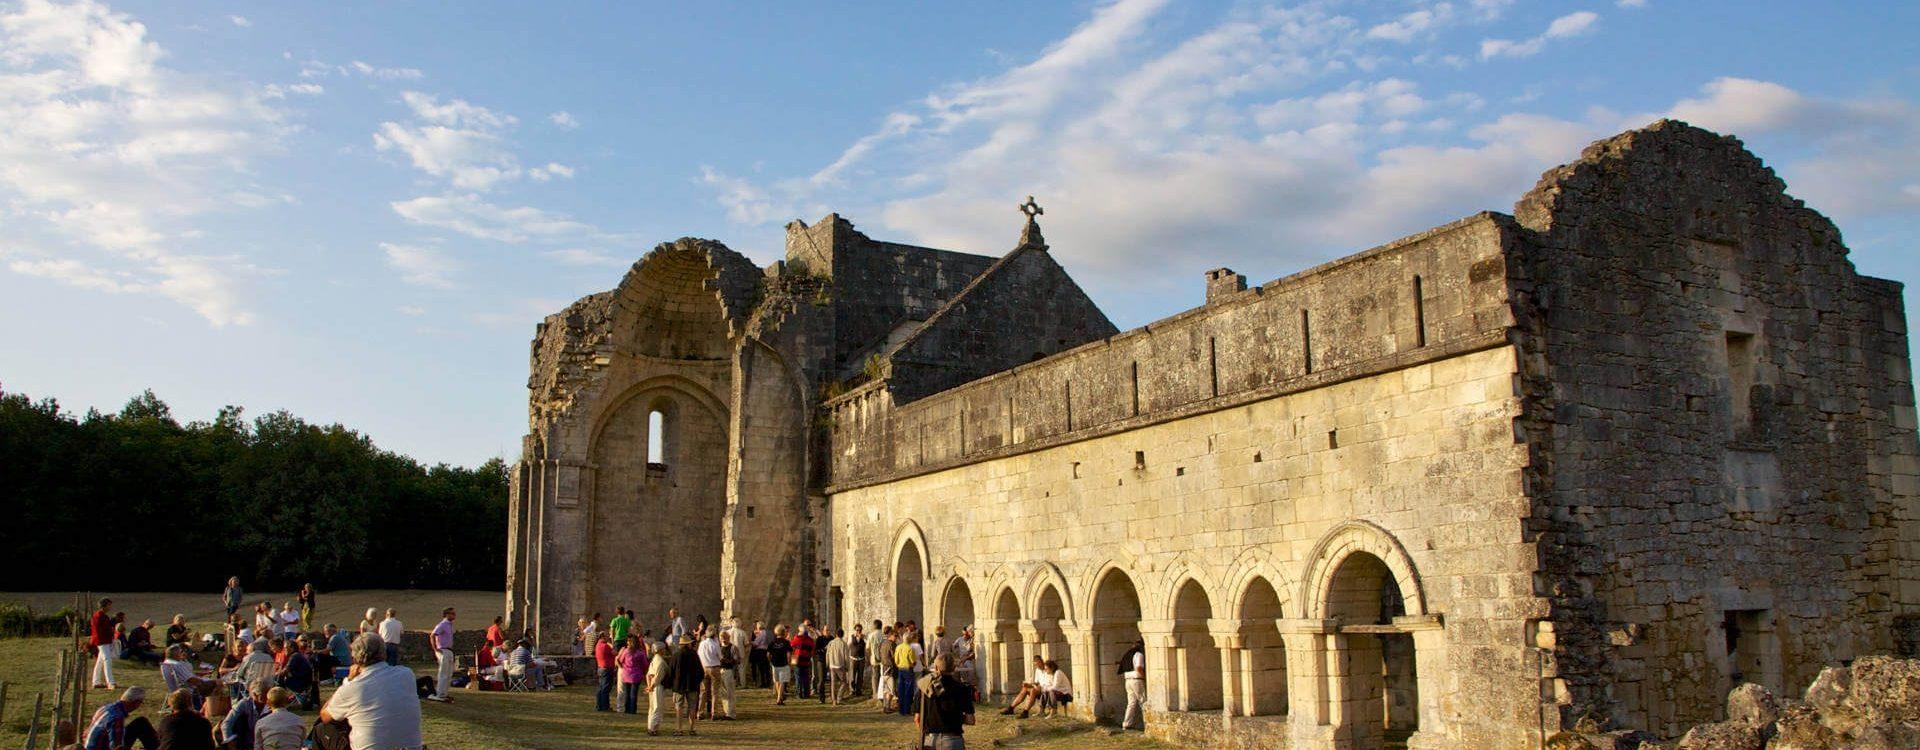 Welcome to Brantôme, Bourdeilles, Mareuil, Villars